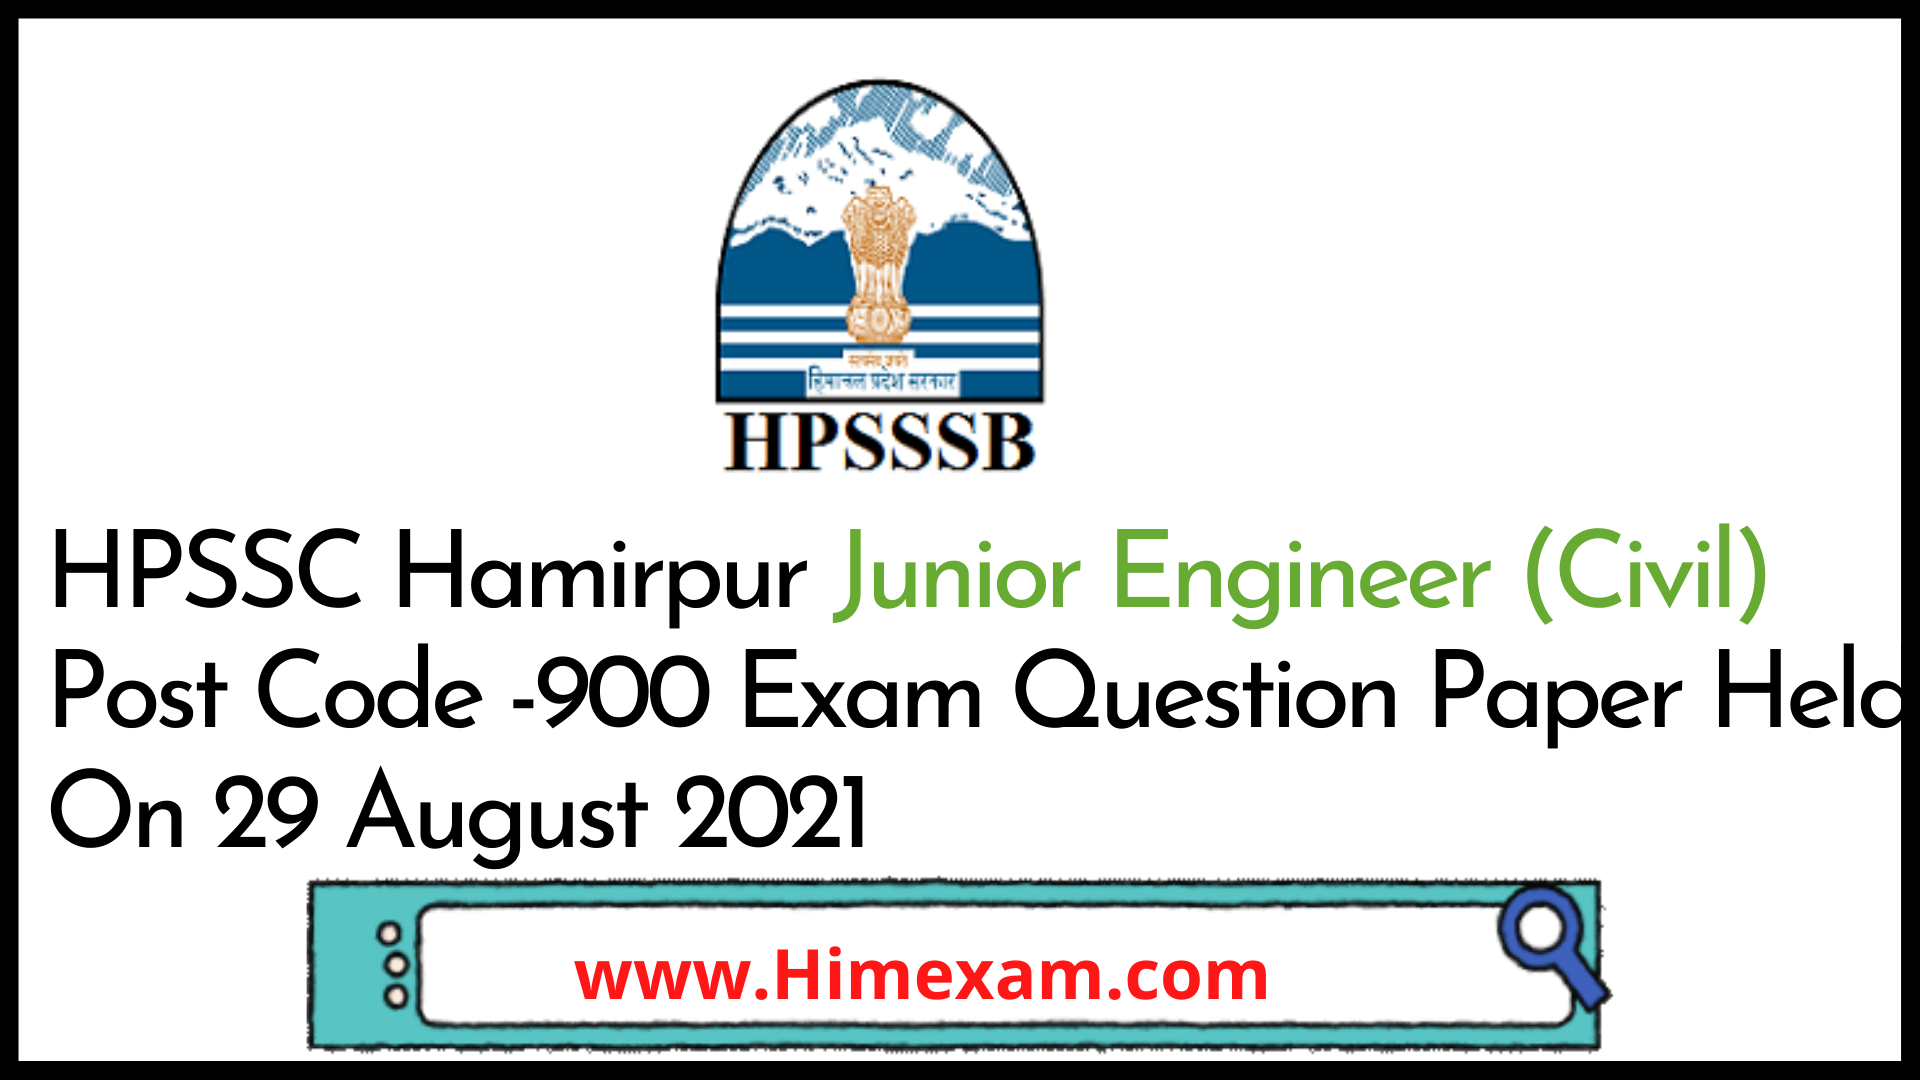 HPSSC Hamirpur Junior Engineer (Civil)  Post Code -900 Exam Question Paper Held On 29 August 2021